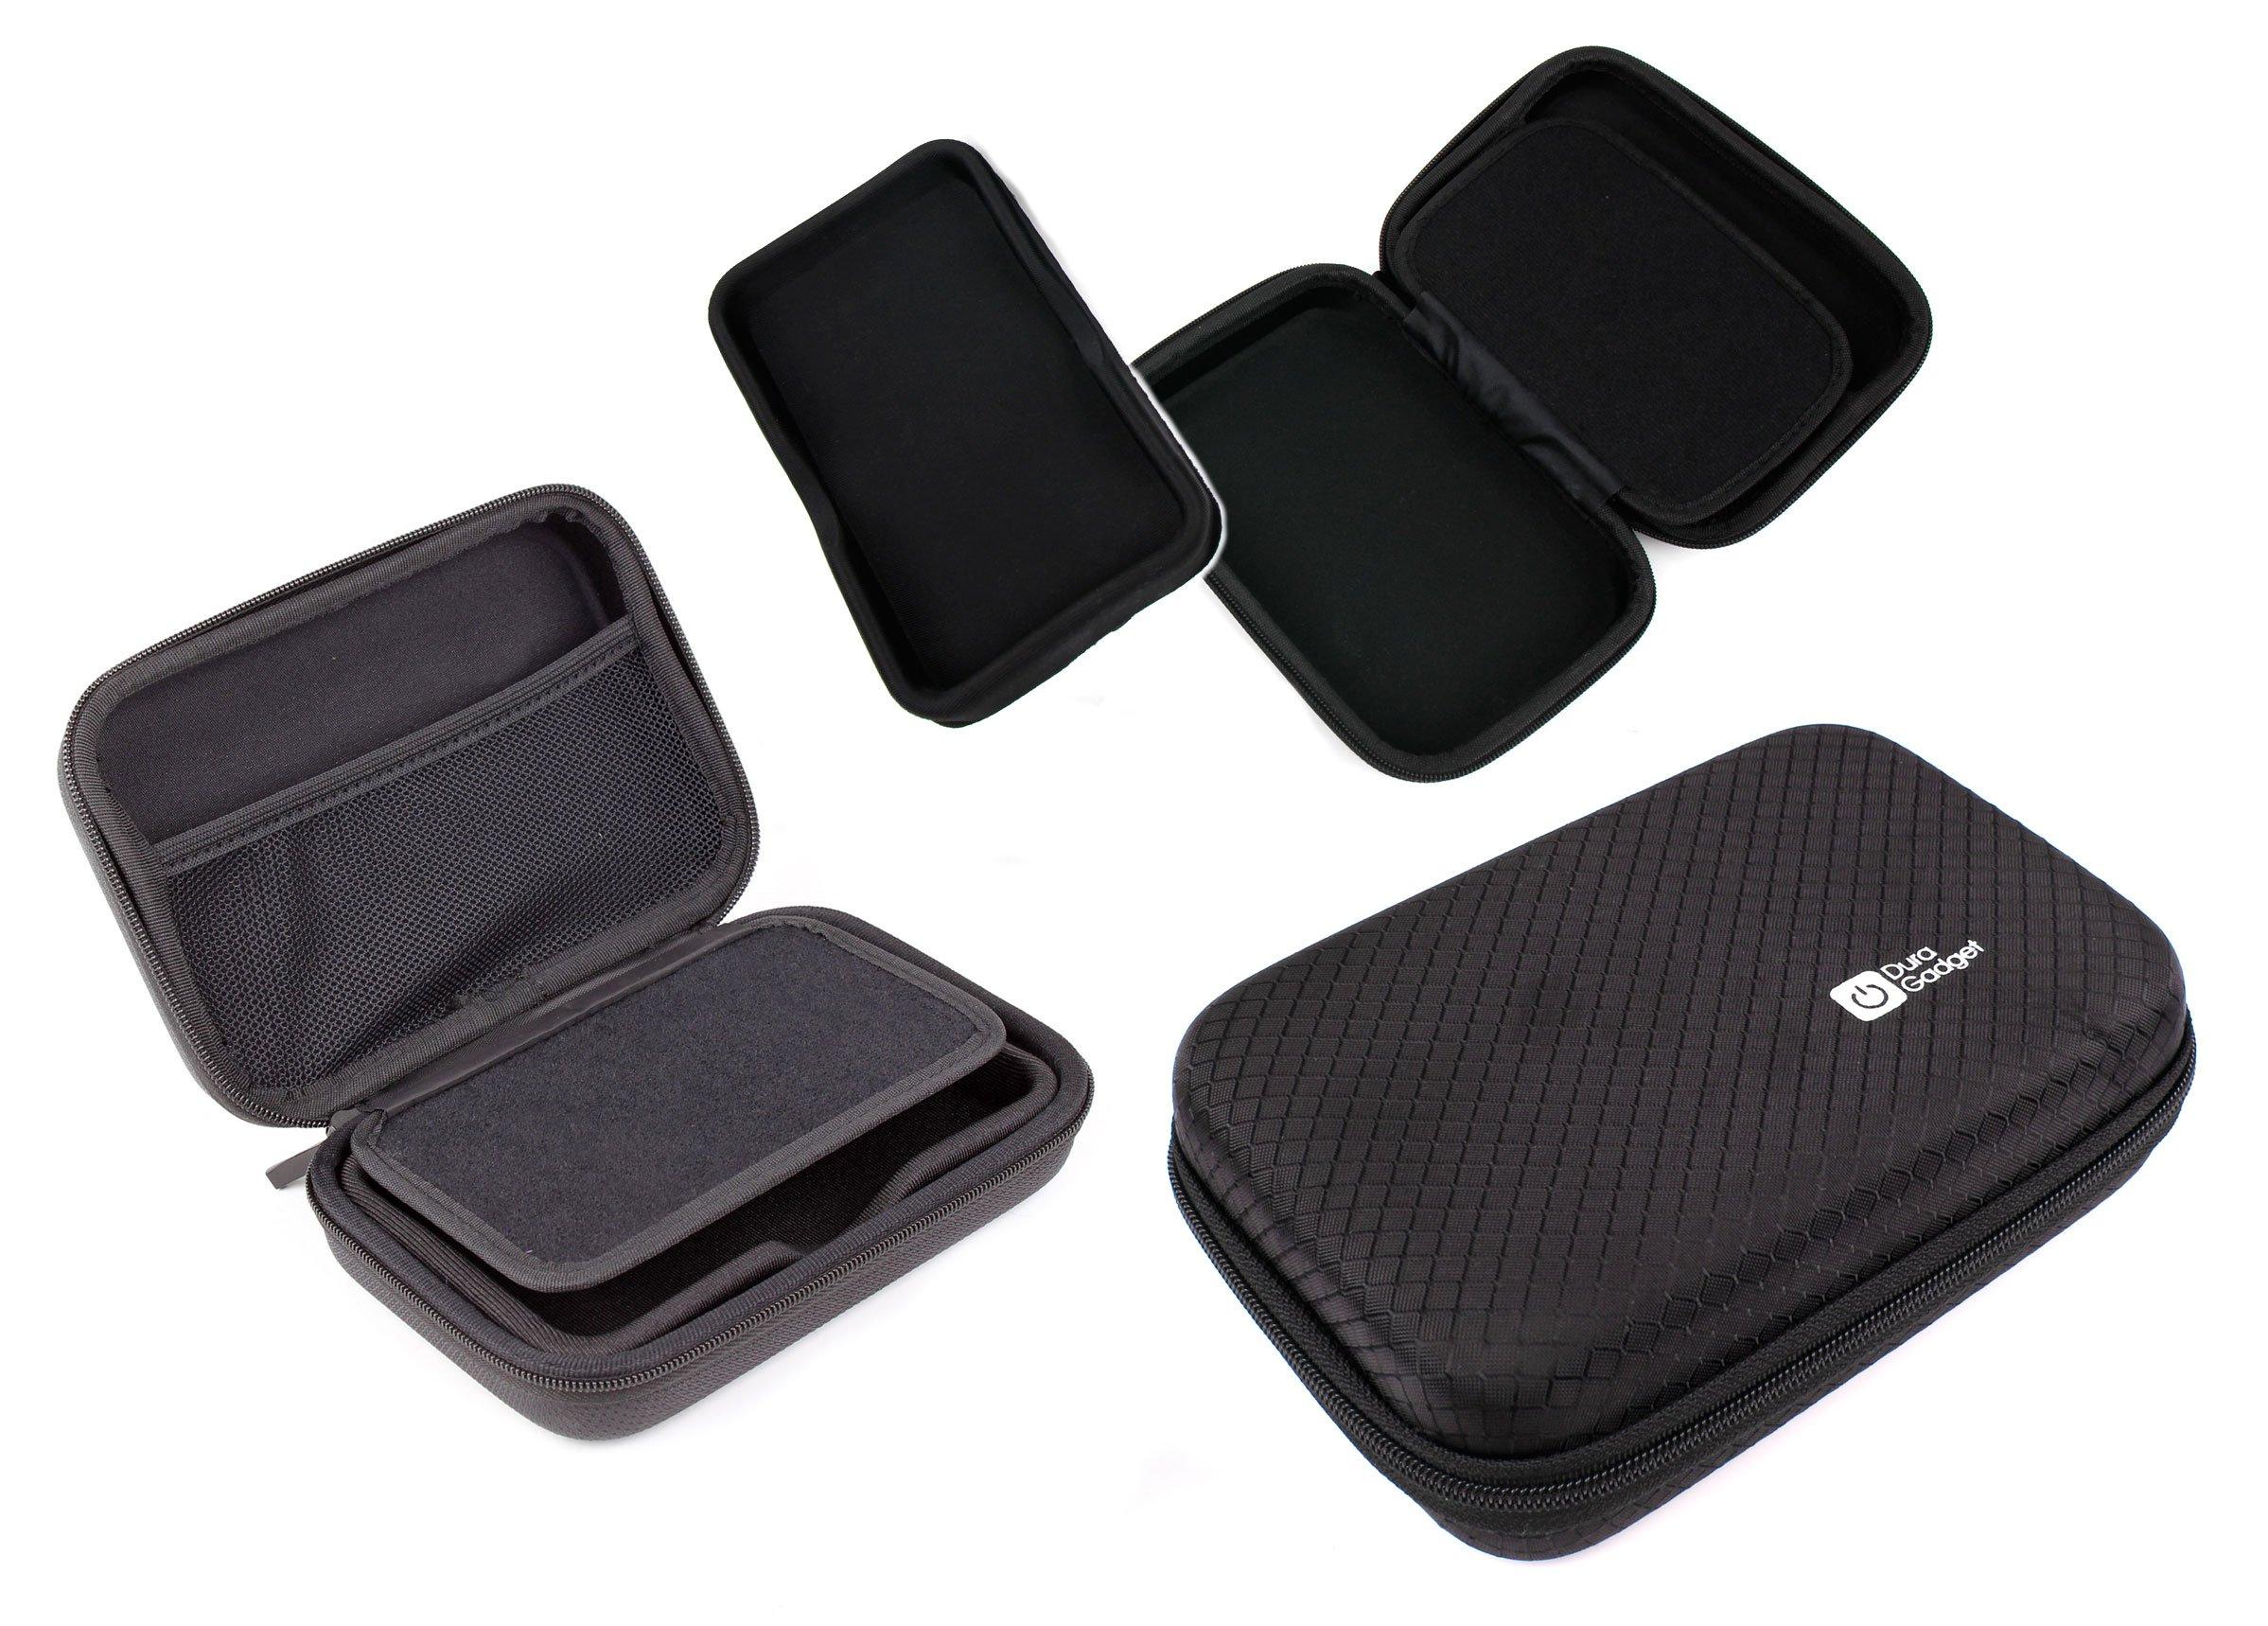 DURAGADGET 5-inch Hard Shell EVA Case in Matte Black for The Tomtom Go Basic 5 inch | Tomtom Rider 420